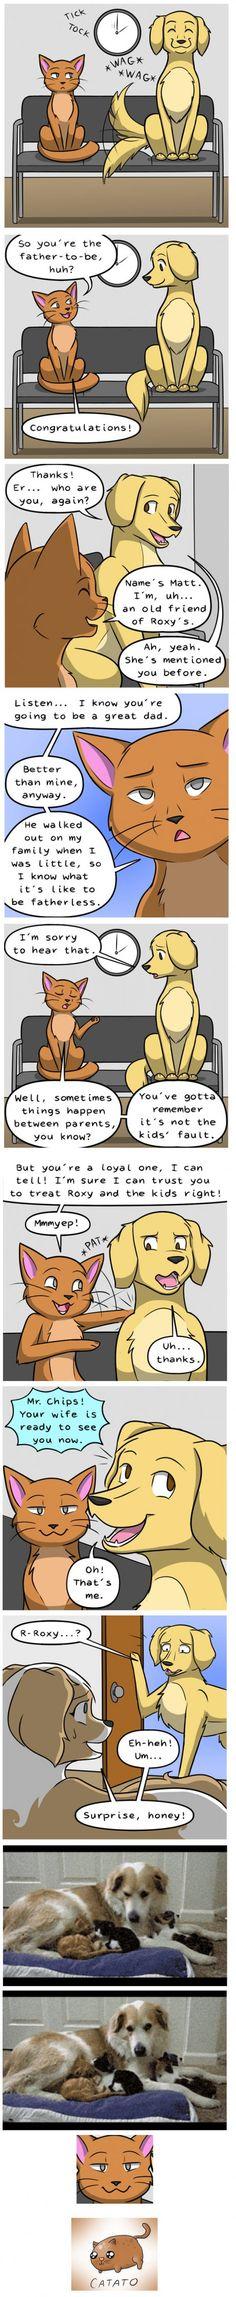 What a b*tch! (Behind the GIFs Comic by Kat Swenski)